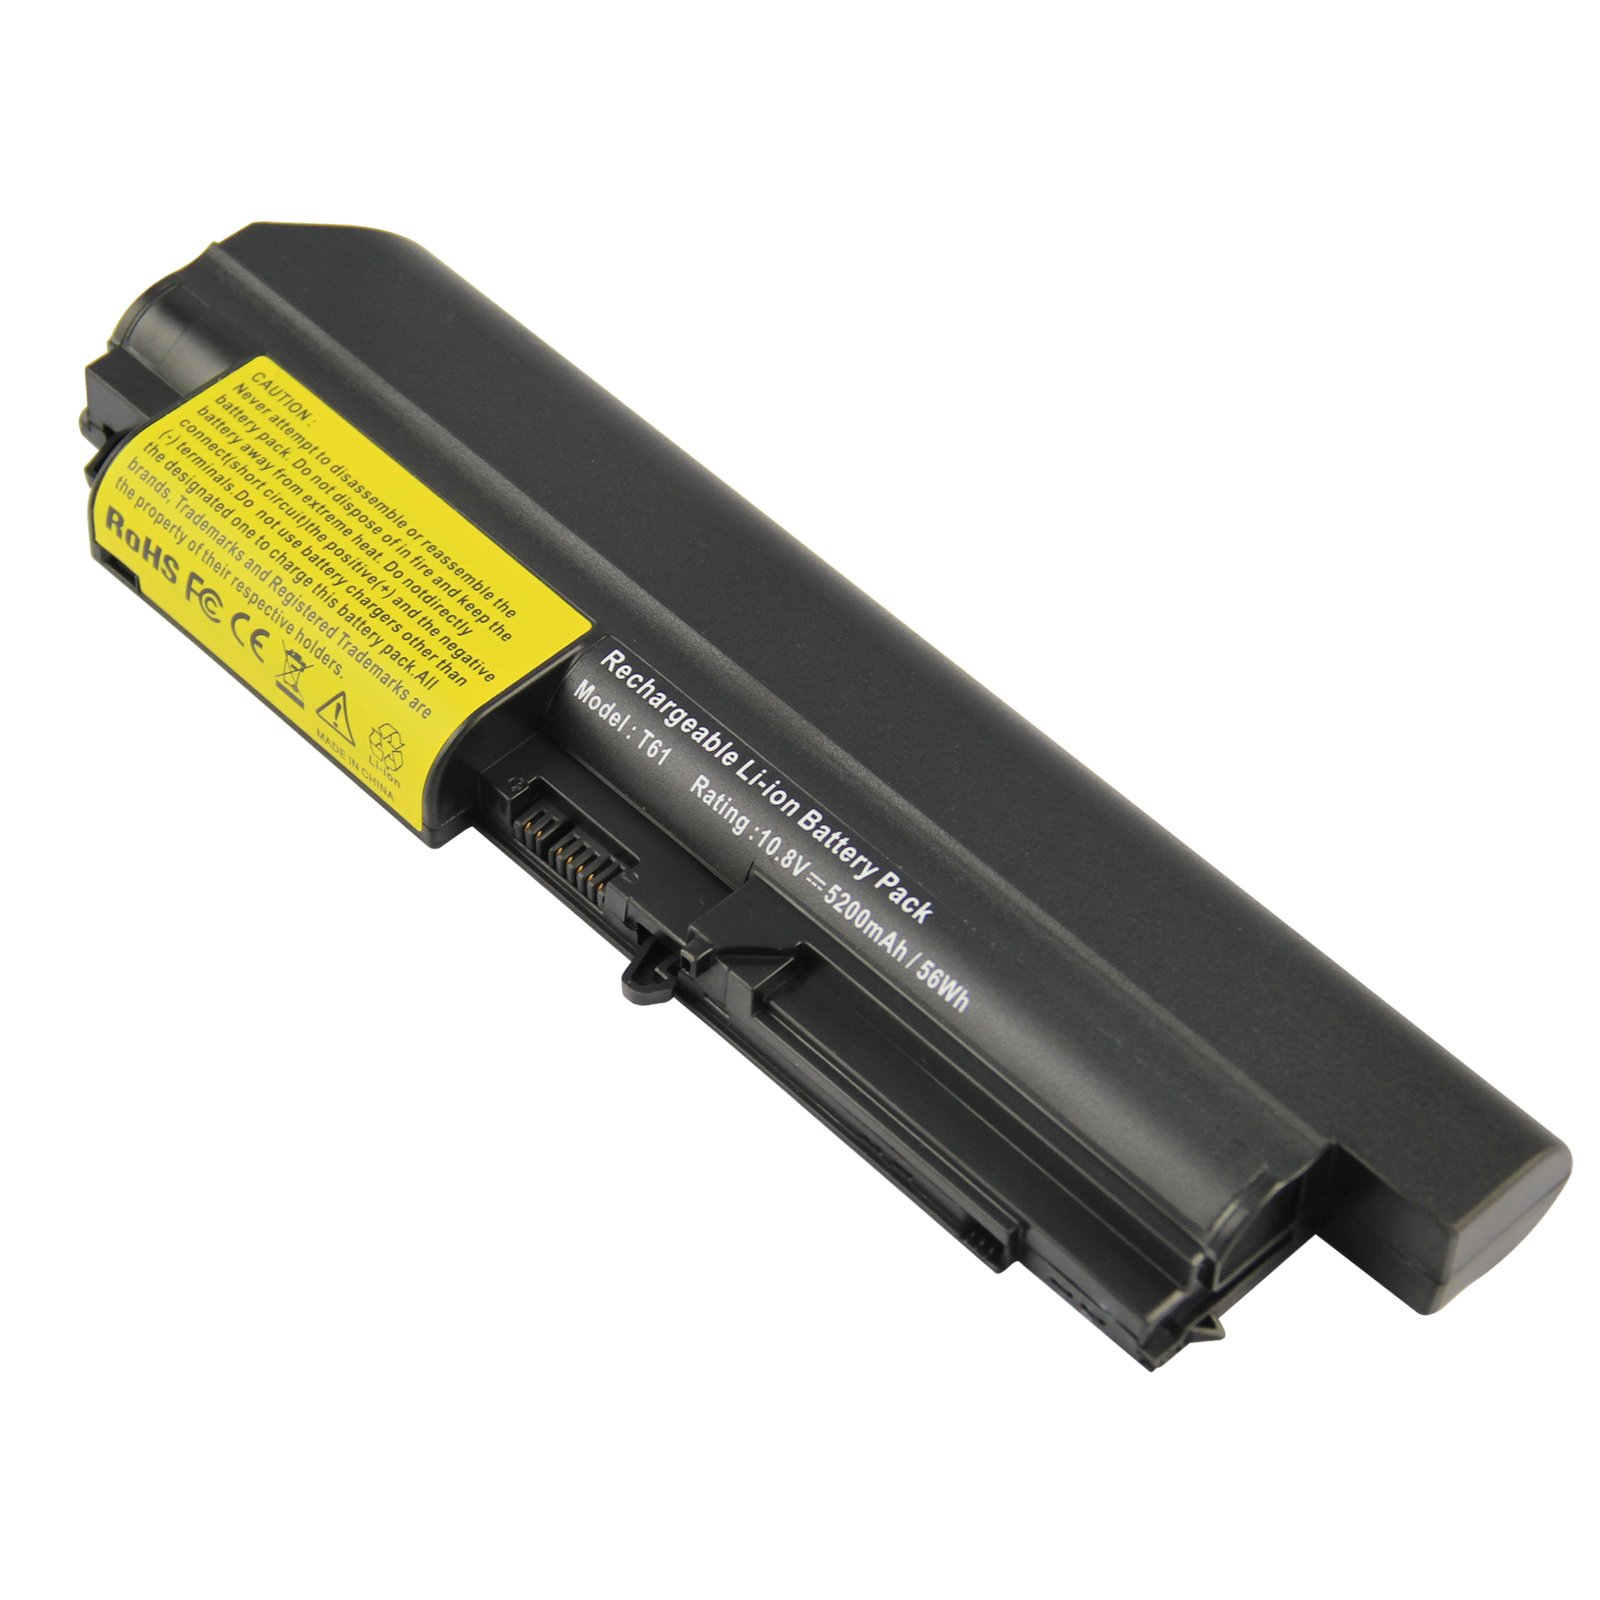 Bateria para IBM ThinkPad Widescreen R61 R61i T61 T61p T400 R400 Series 14.1 Inch -Futurebatt